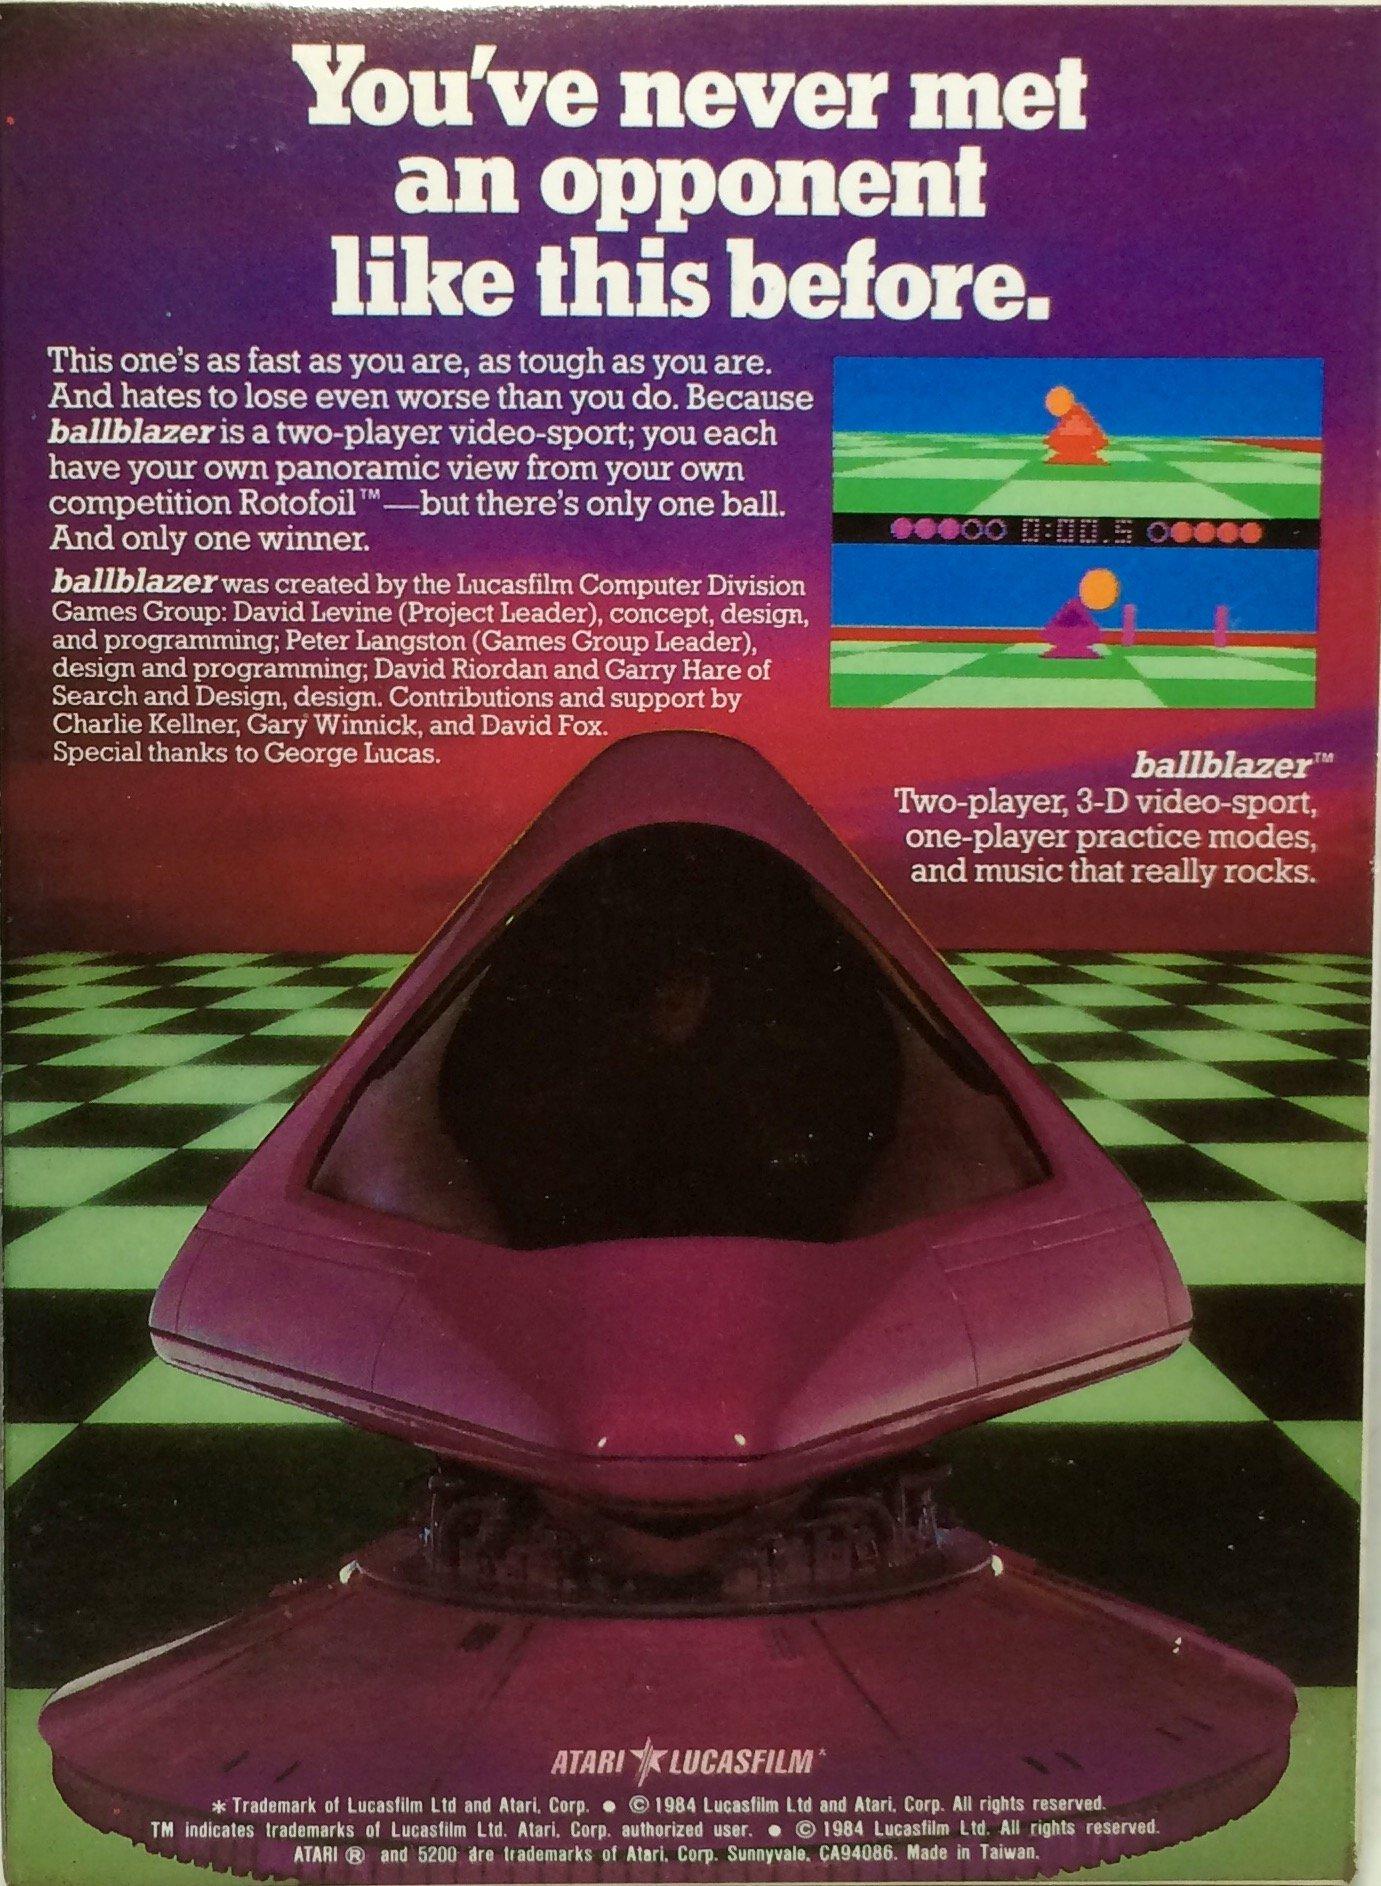 Ballblazer - Lucasfilm - NTSC - Atari 5200 Supersystem by Lucasfilm (Image #2)